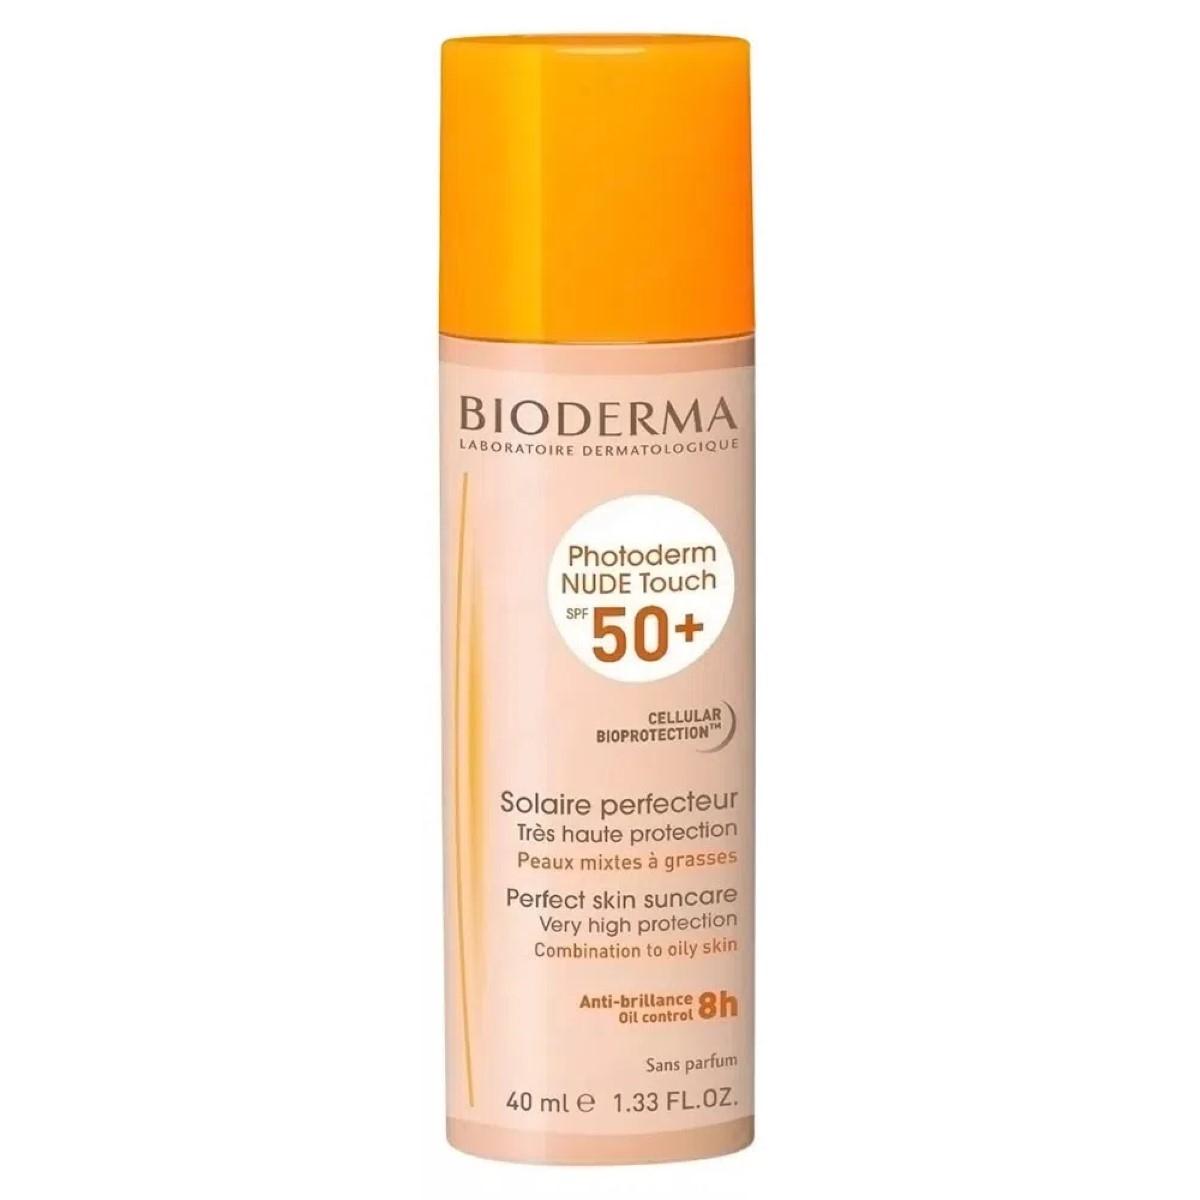 Resenha: protetor Photoderm NUDE Touch FPS50+ da Bioderma